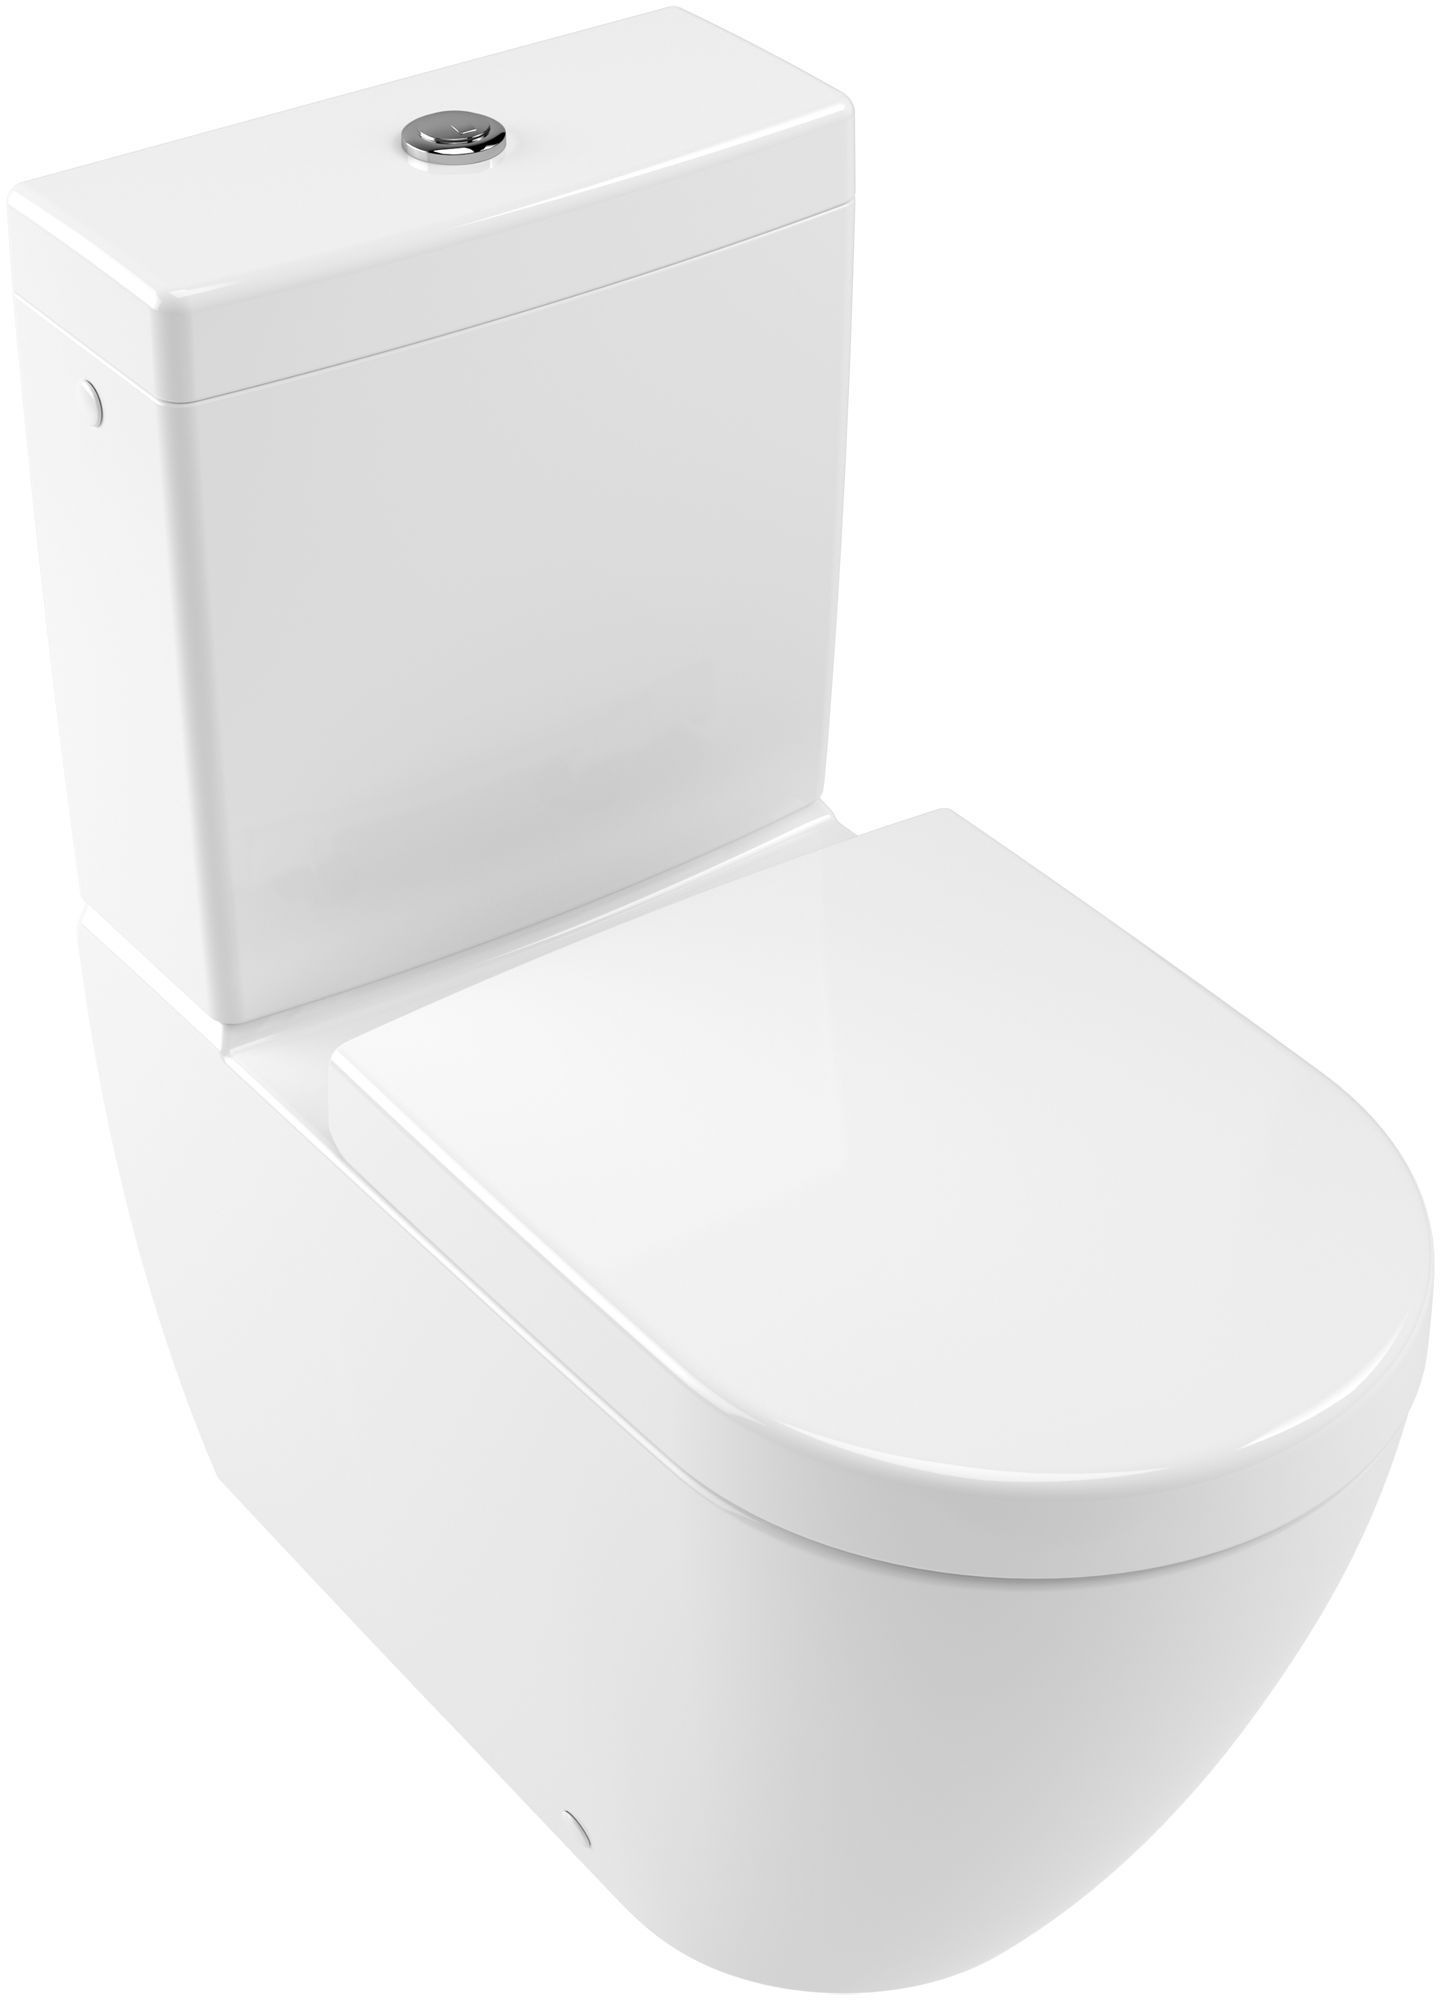 Villeroy & Boch Subway 2.0 Tiefspül-Stand-WC für Kombination spülrandlos DirectFlush B:37xL:70cm weiß Ceramicplus 5617R0R1